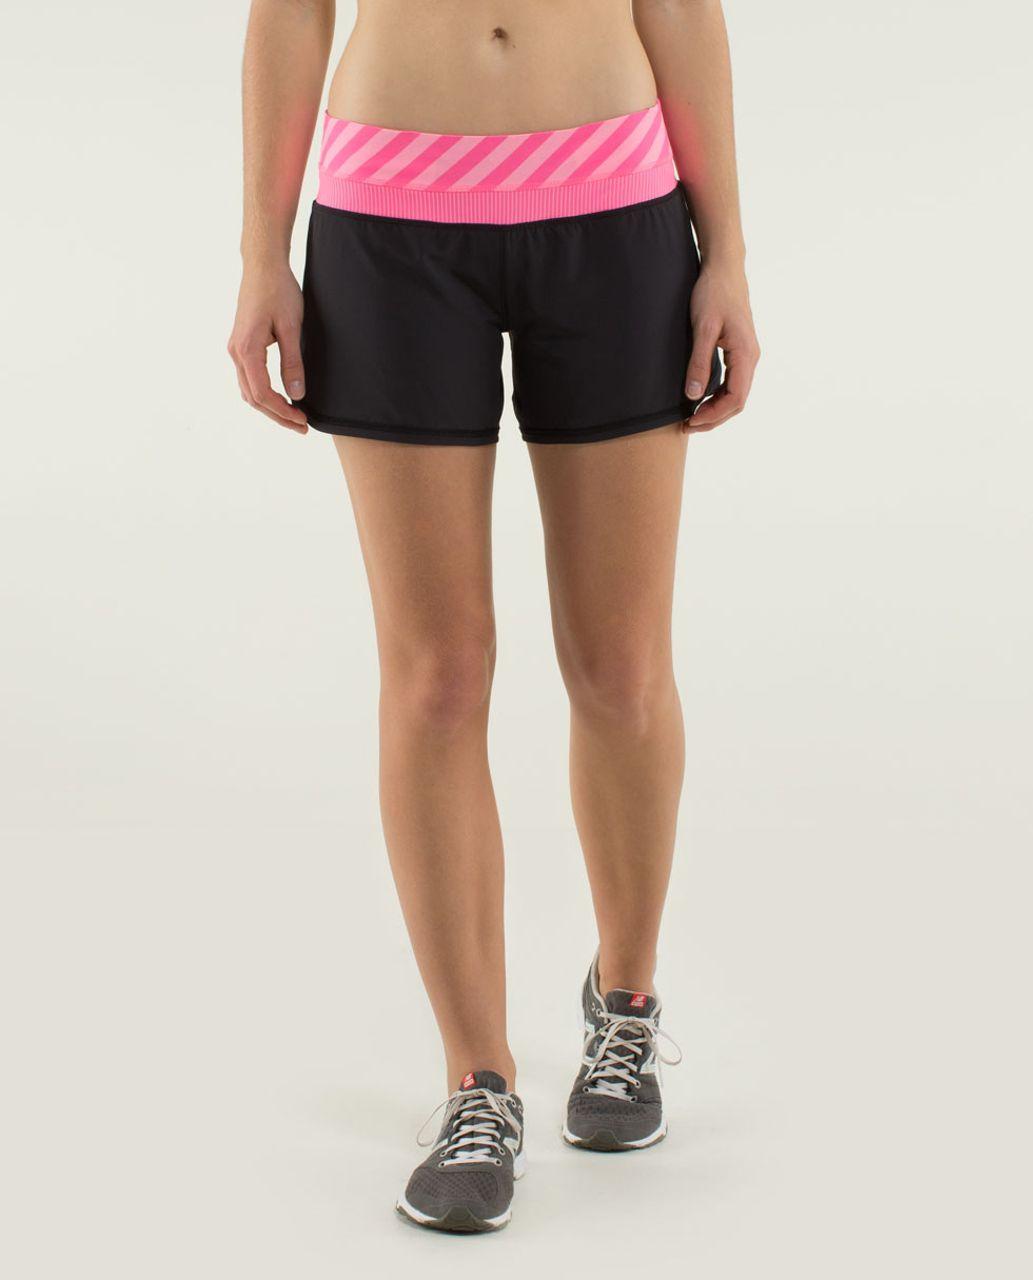 Lululemon Groovy Run Short *4-way Stretch - Black / Mini Hyper Stripe Zing Pink Light / Apex Stripe Zing Pink Light